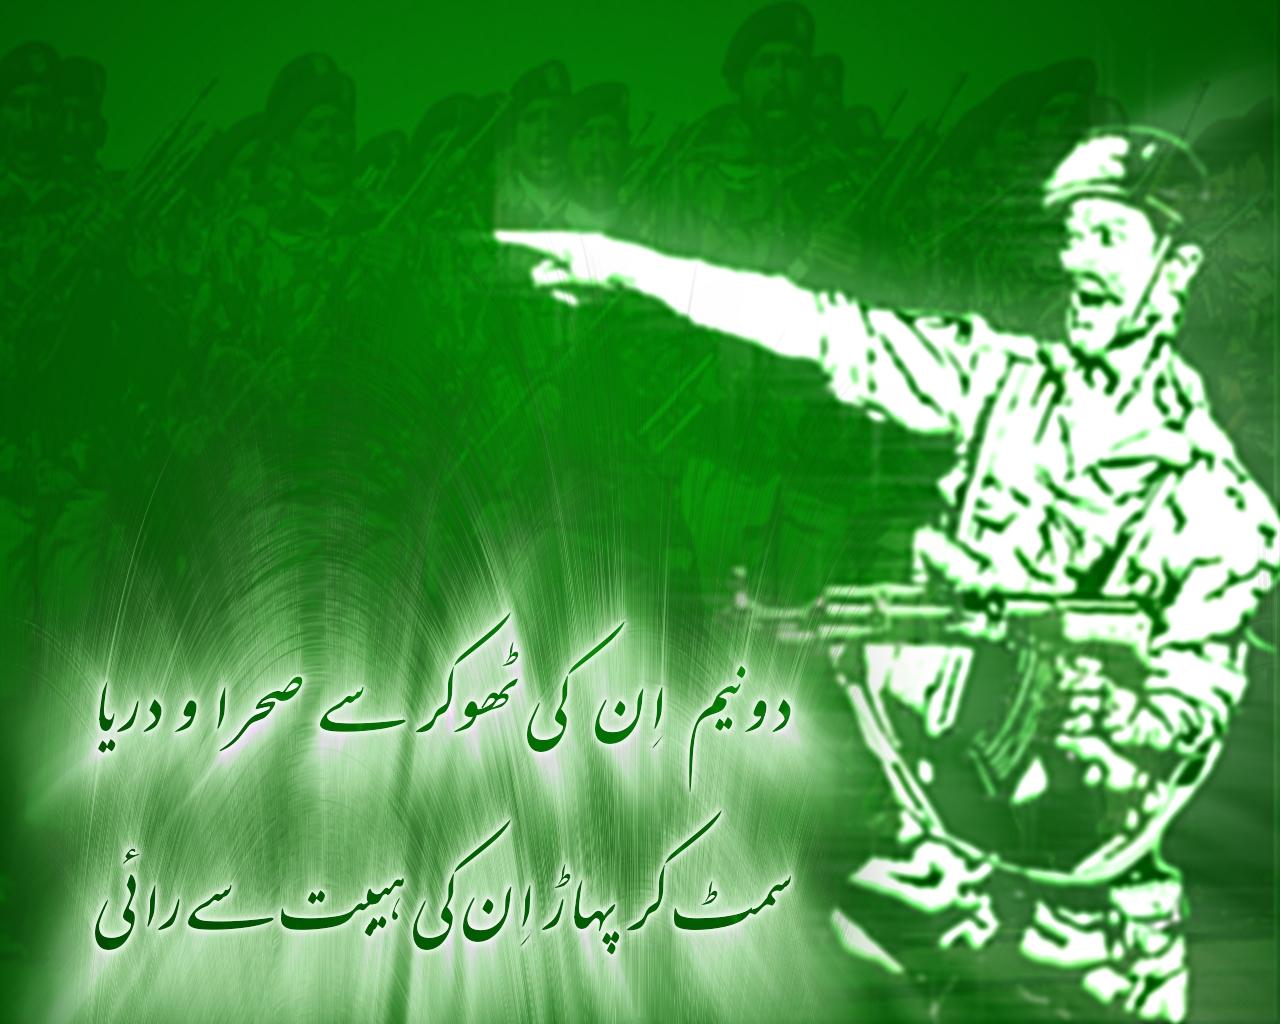 http://3.bp.blogspot.com/-in3w3UbGz3I/UA8rTeuECzI/AAAAAAAABr8/ZmowwUVMscU/s1600/14++Pakistan+army.jpg